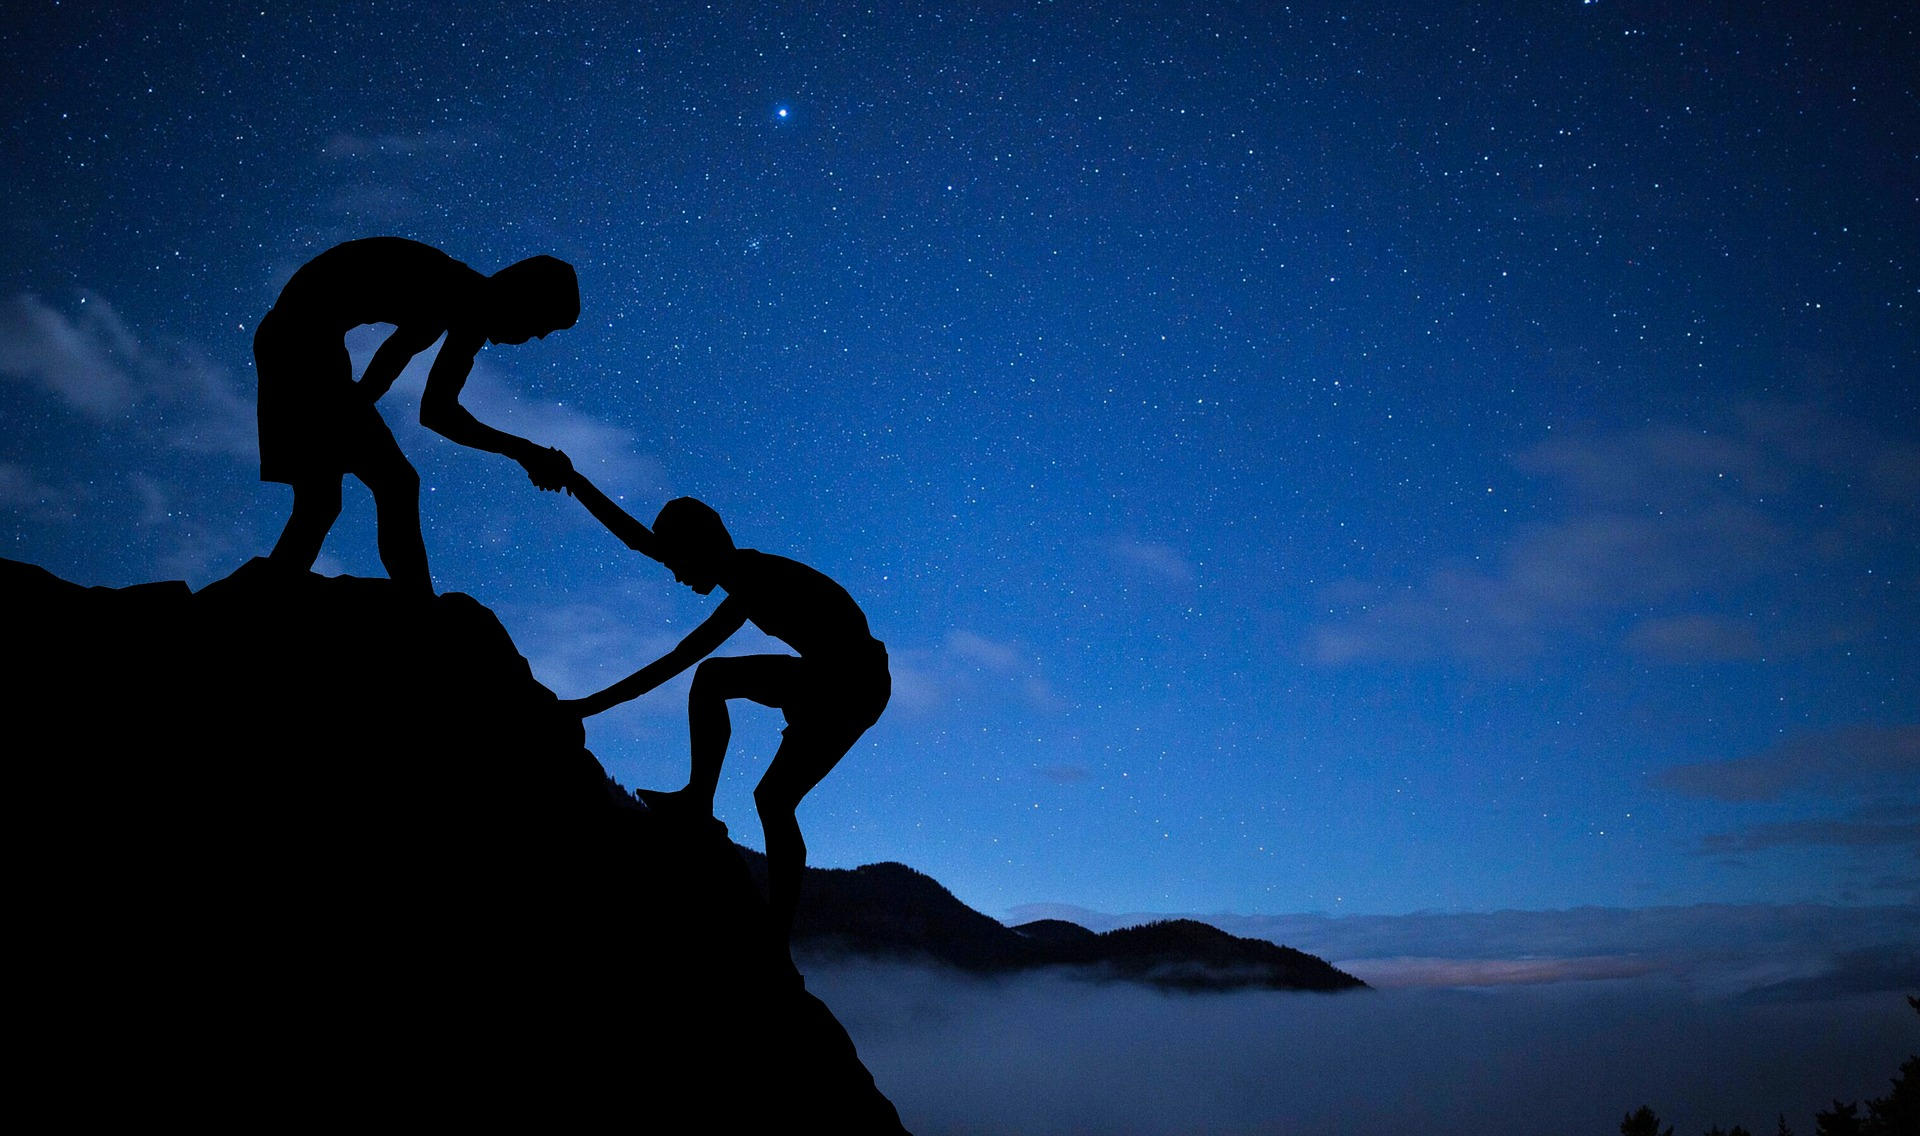 Mentor et entraide